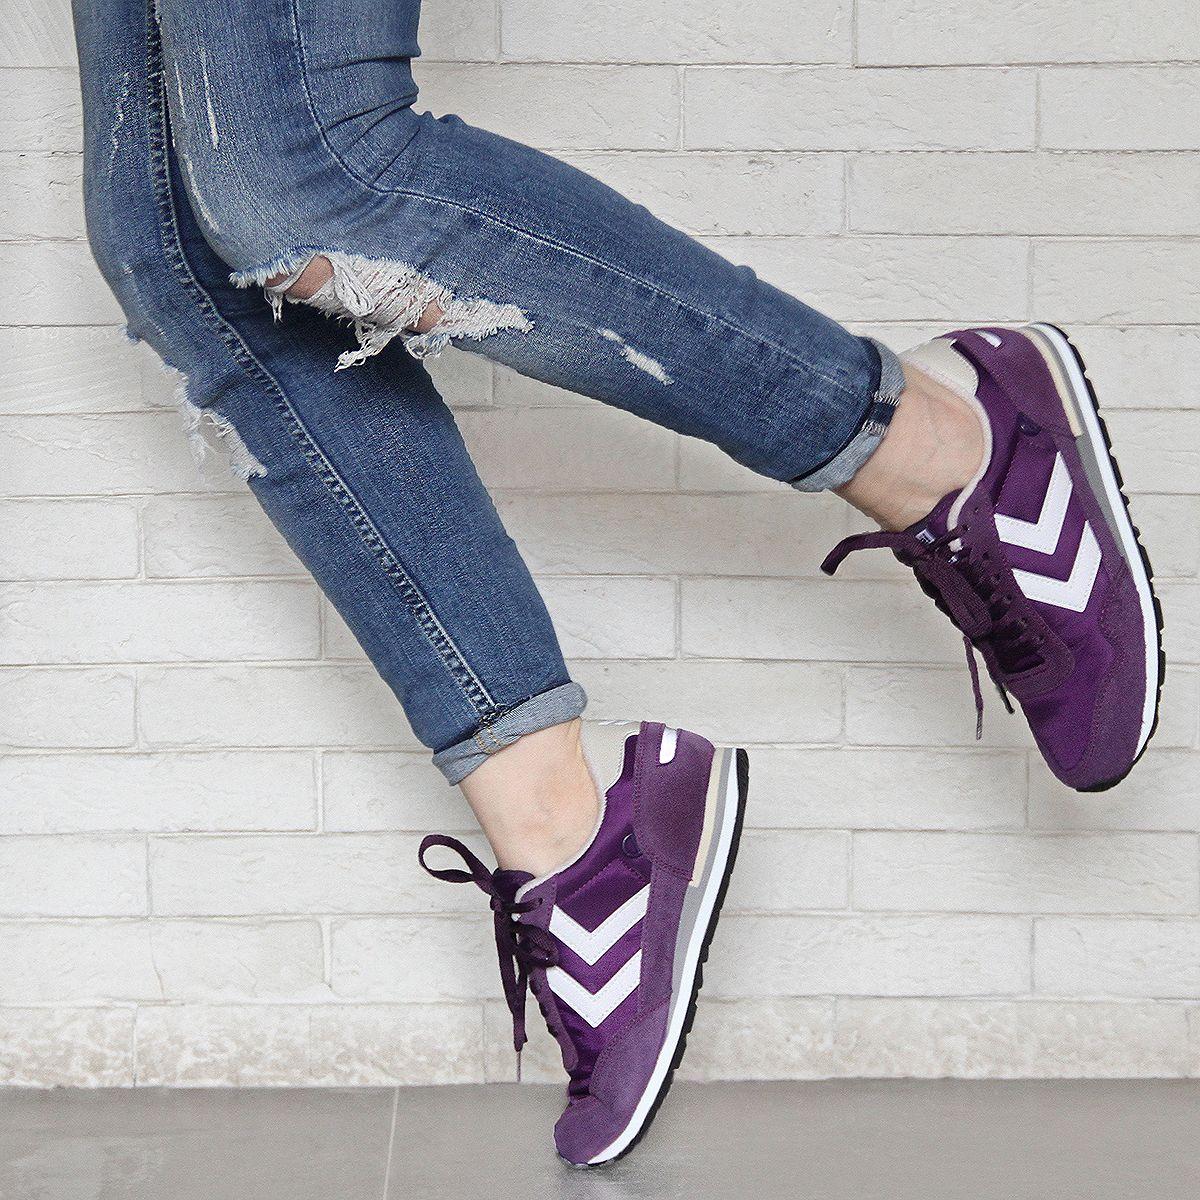 Hummel Photo Tugba Akdag Shoe Inspiration New Balance Sneaker Fashion